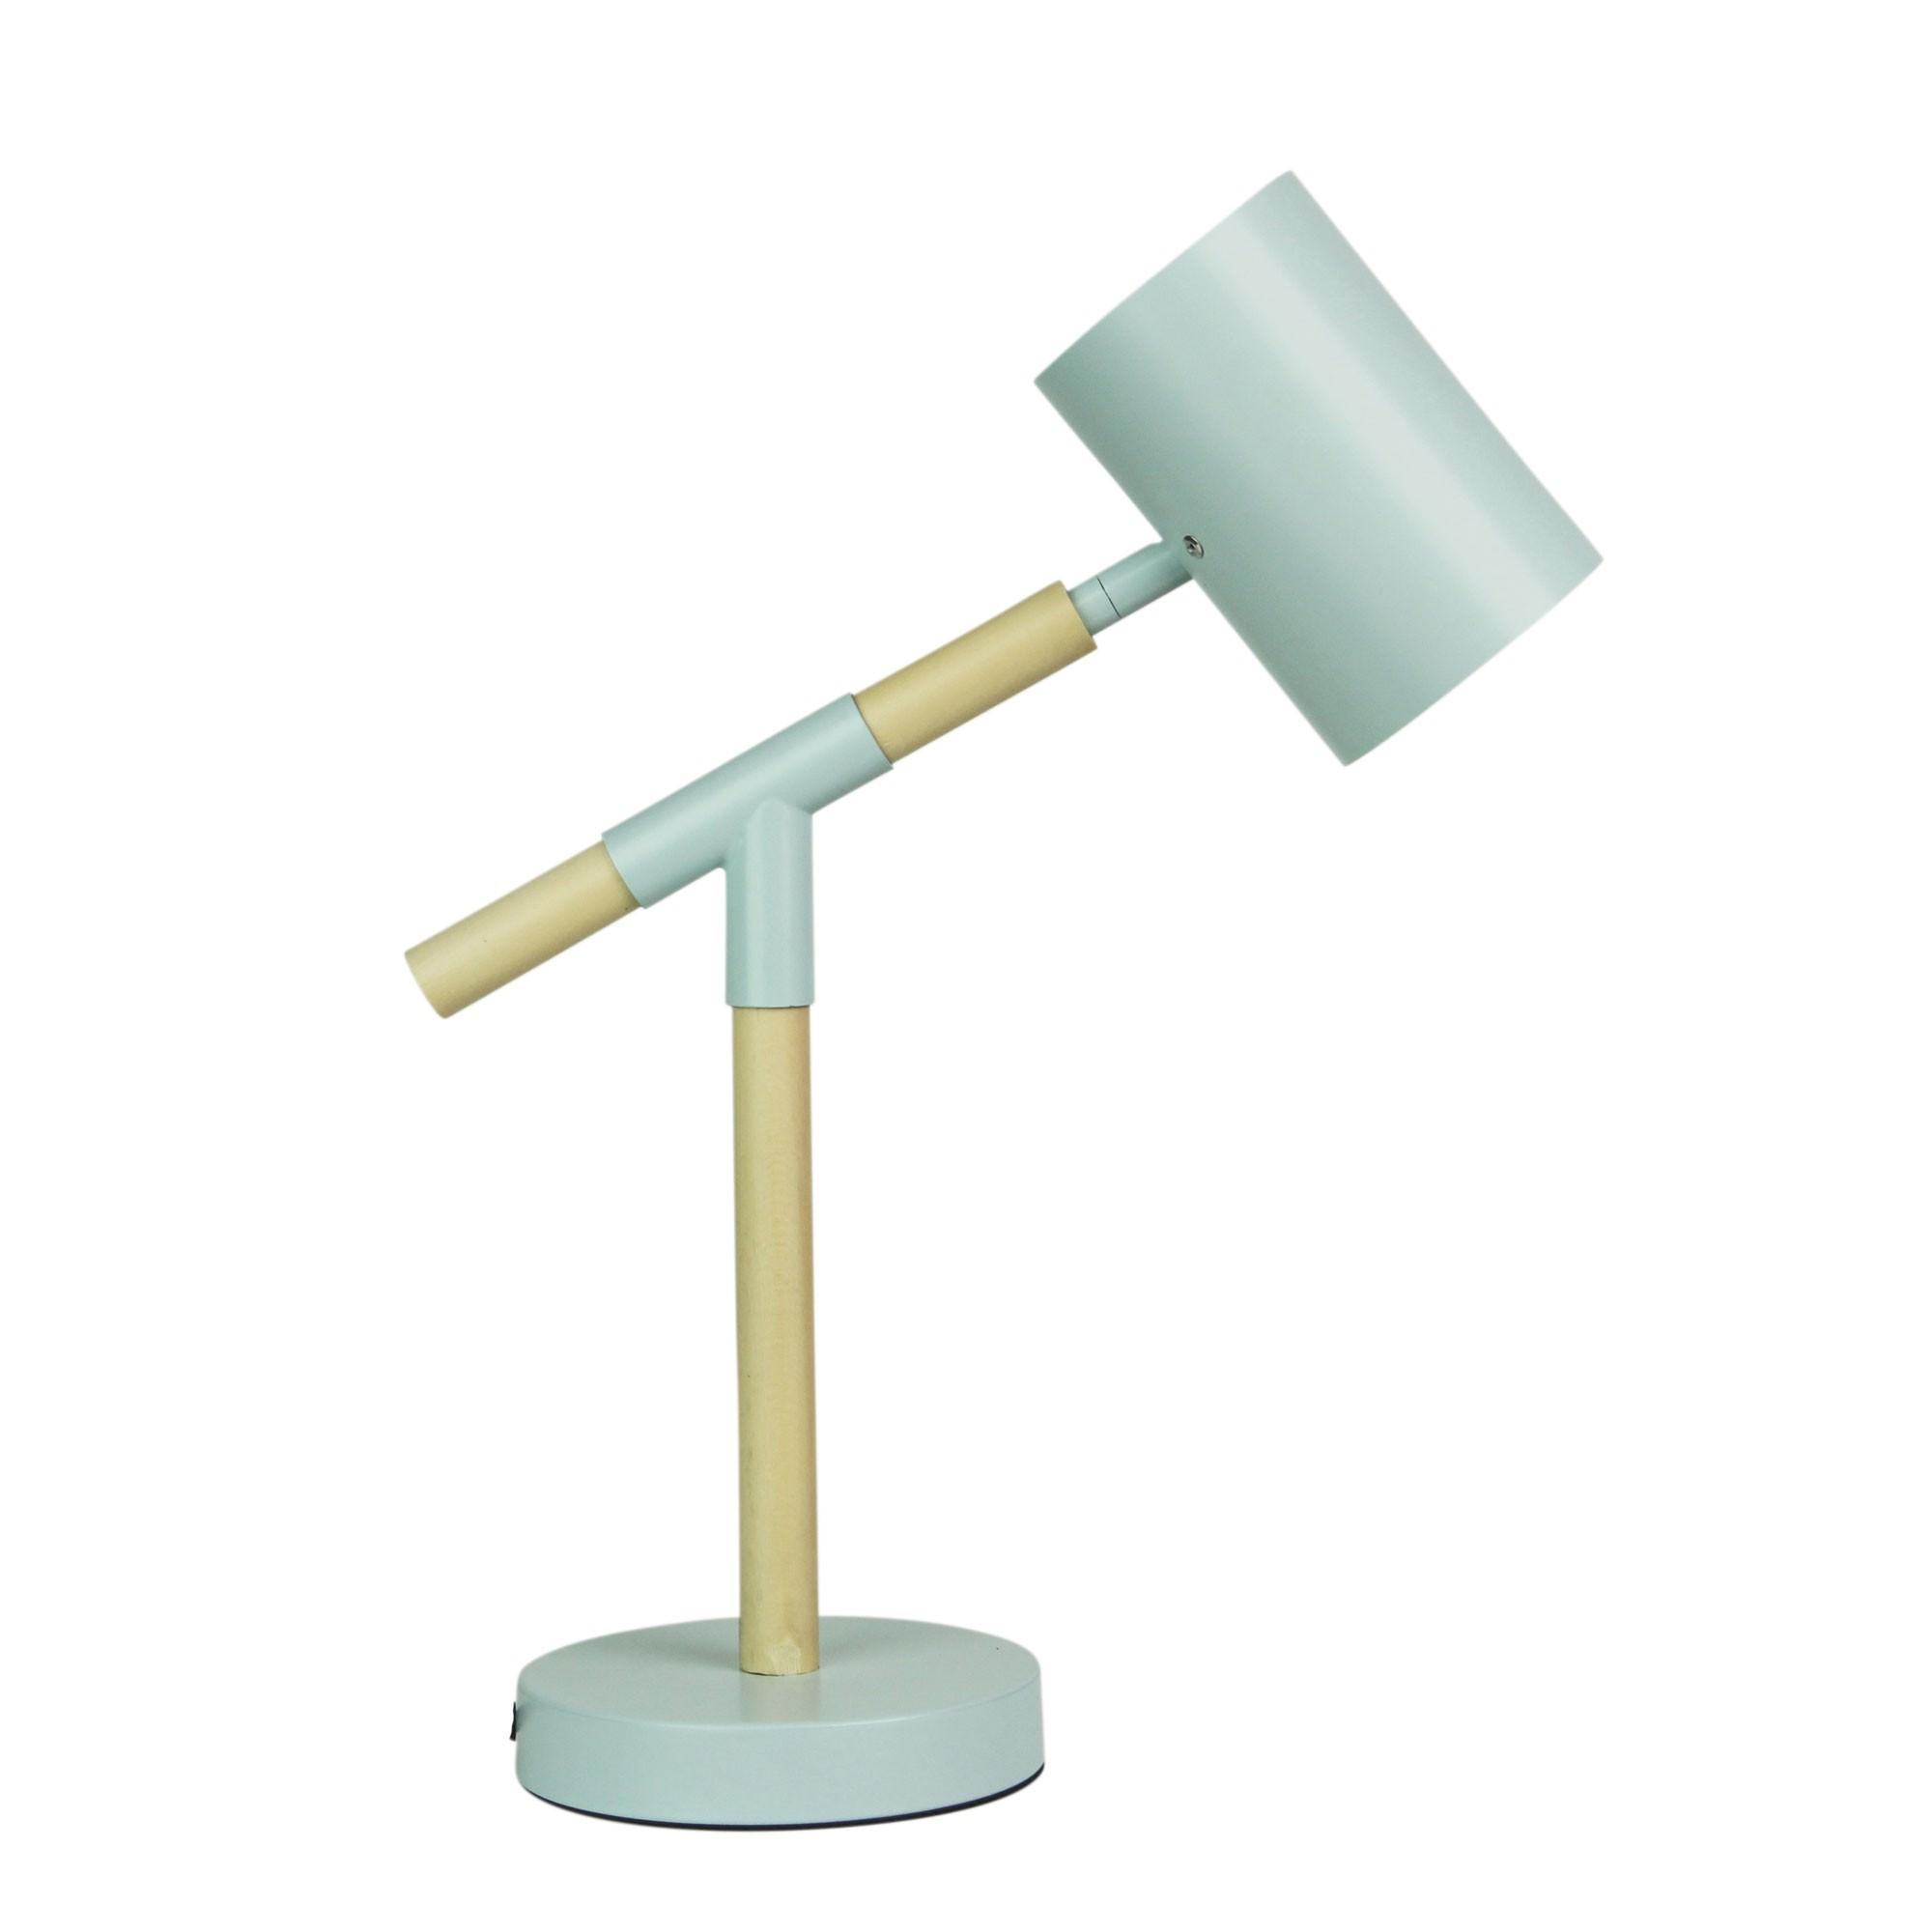 Ludo Timber & Metal LED Desk Lamp, Pale Blue